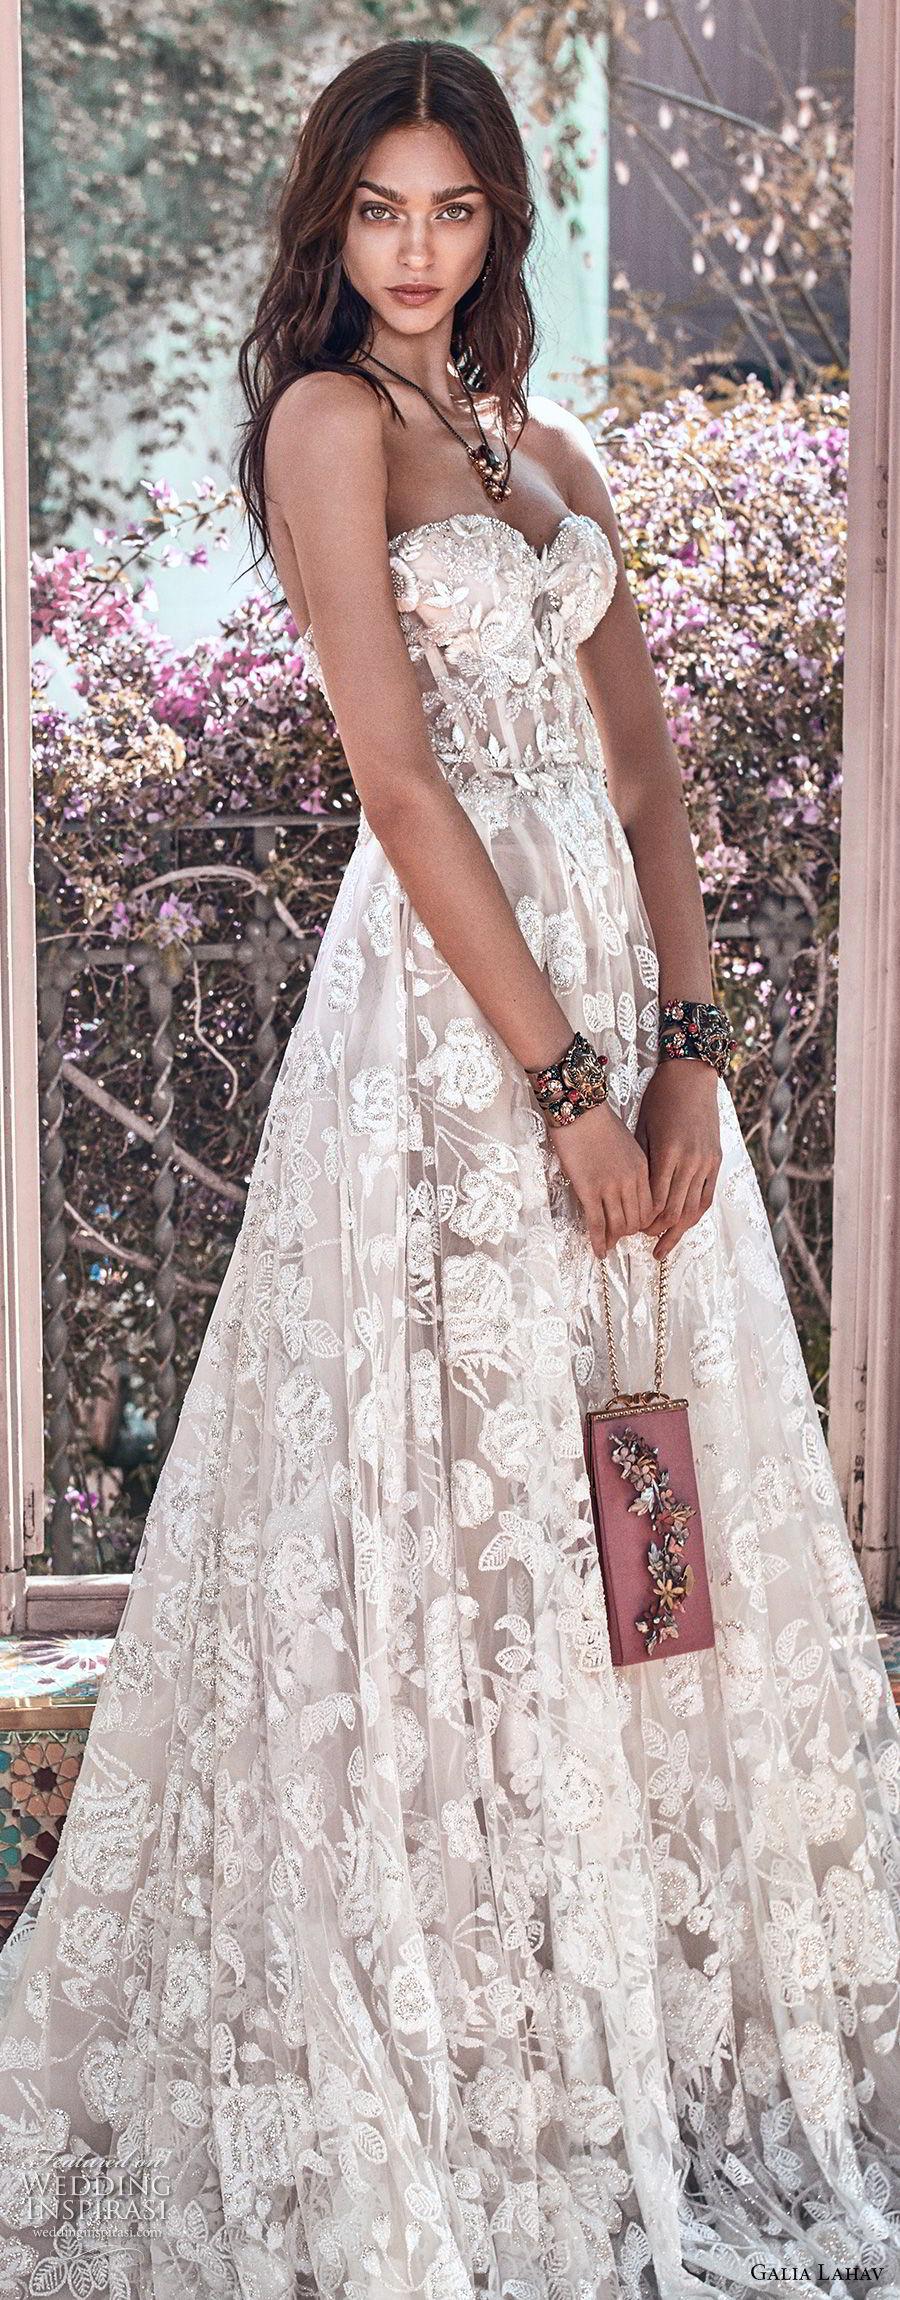 Galia lahav spring 2018 wedding dresses victorian for 2018 spring wedding dresses